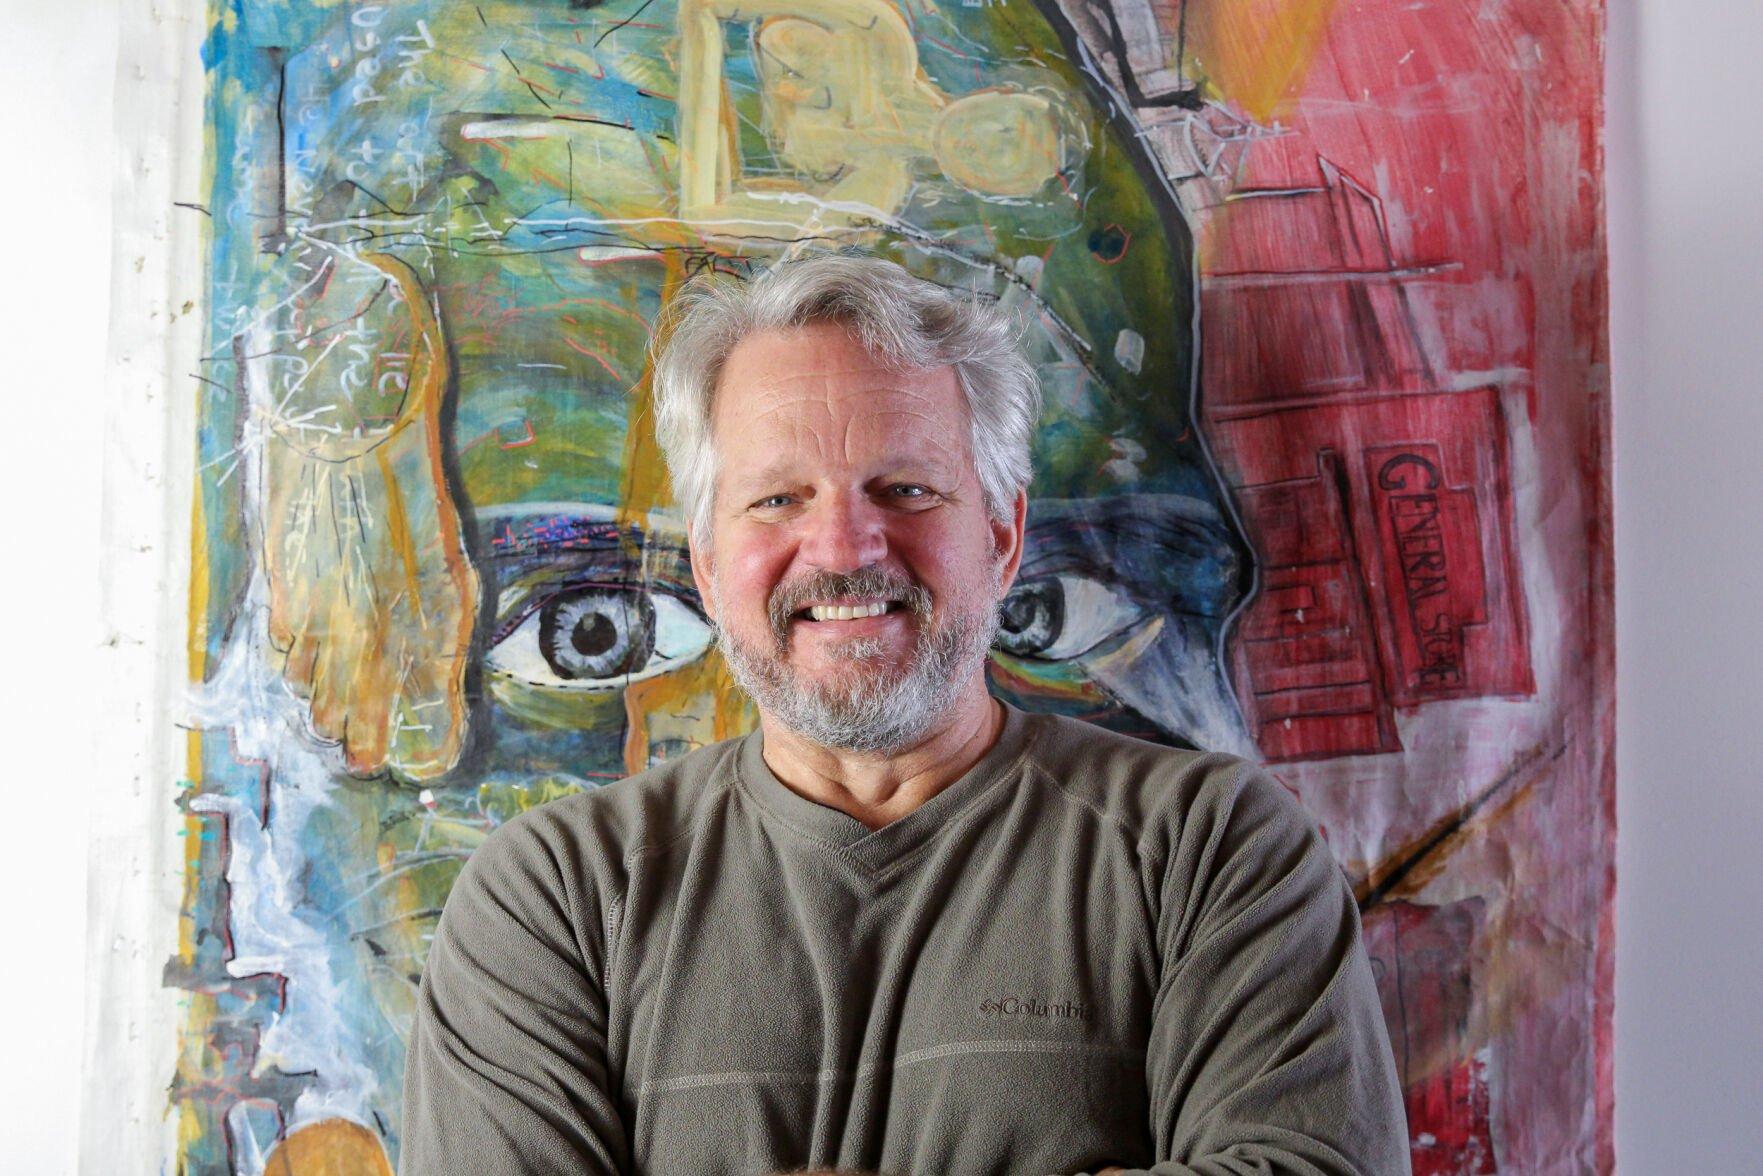 Create Arlington provides community workspace artists, entrepreneurs